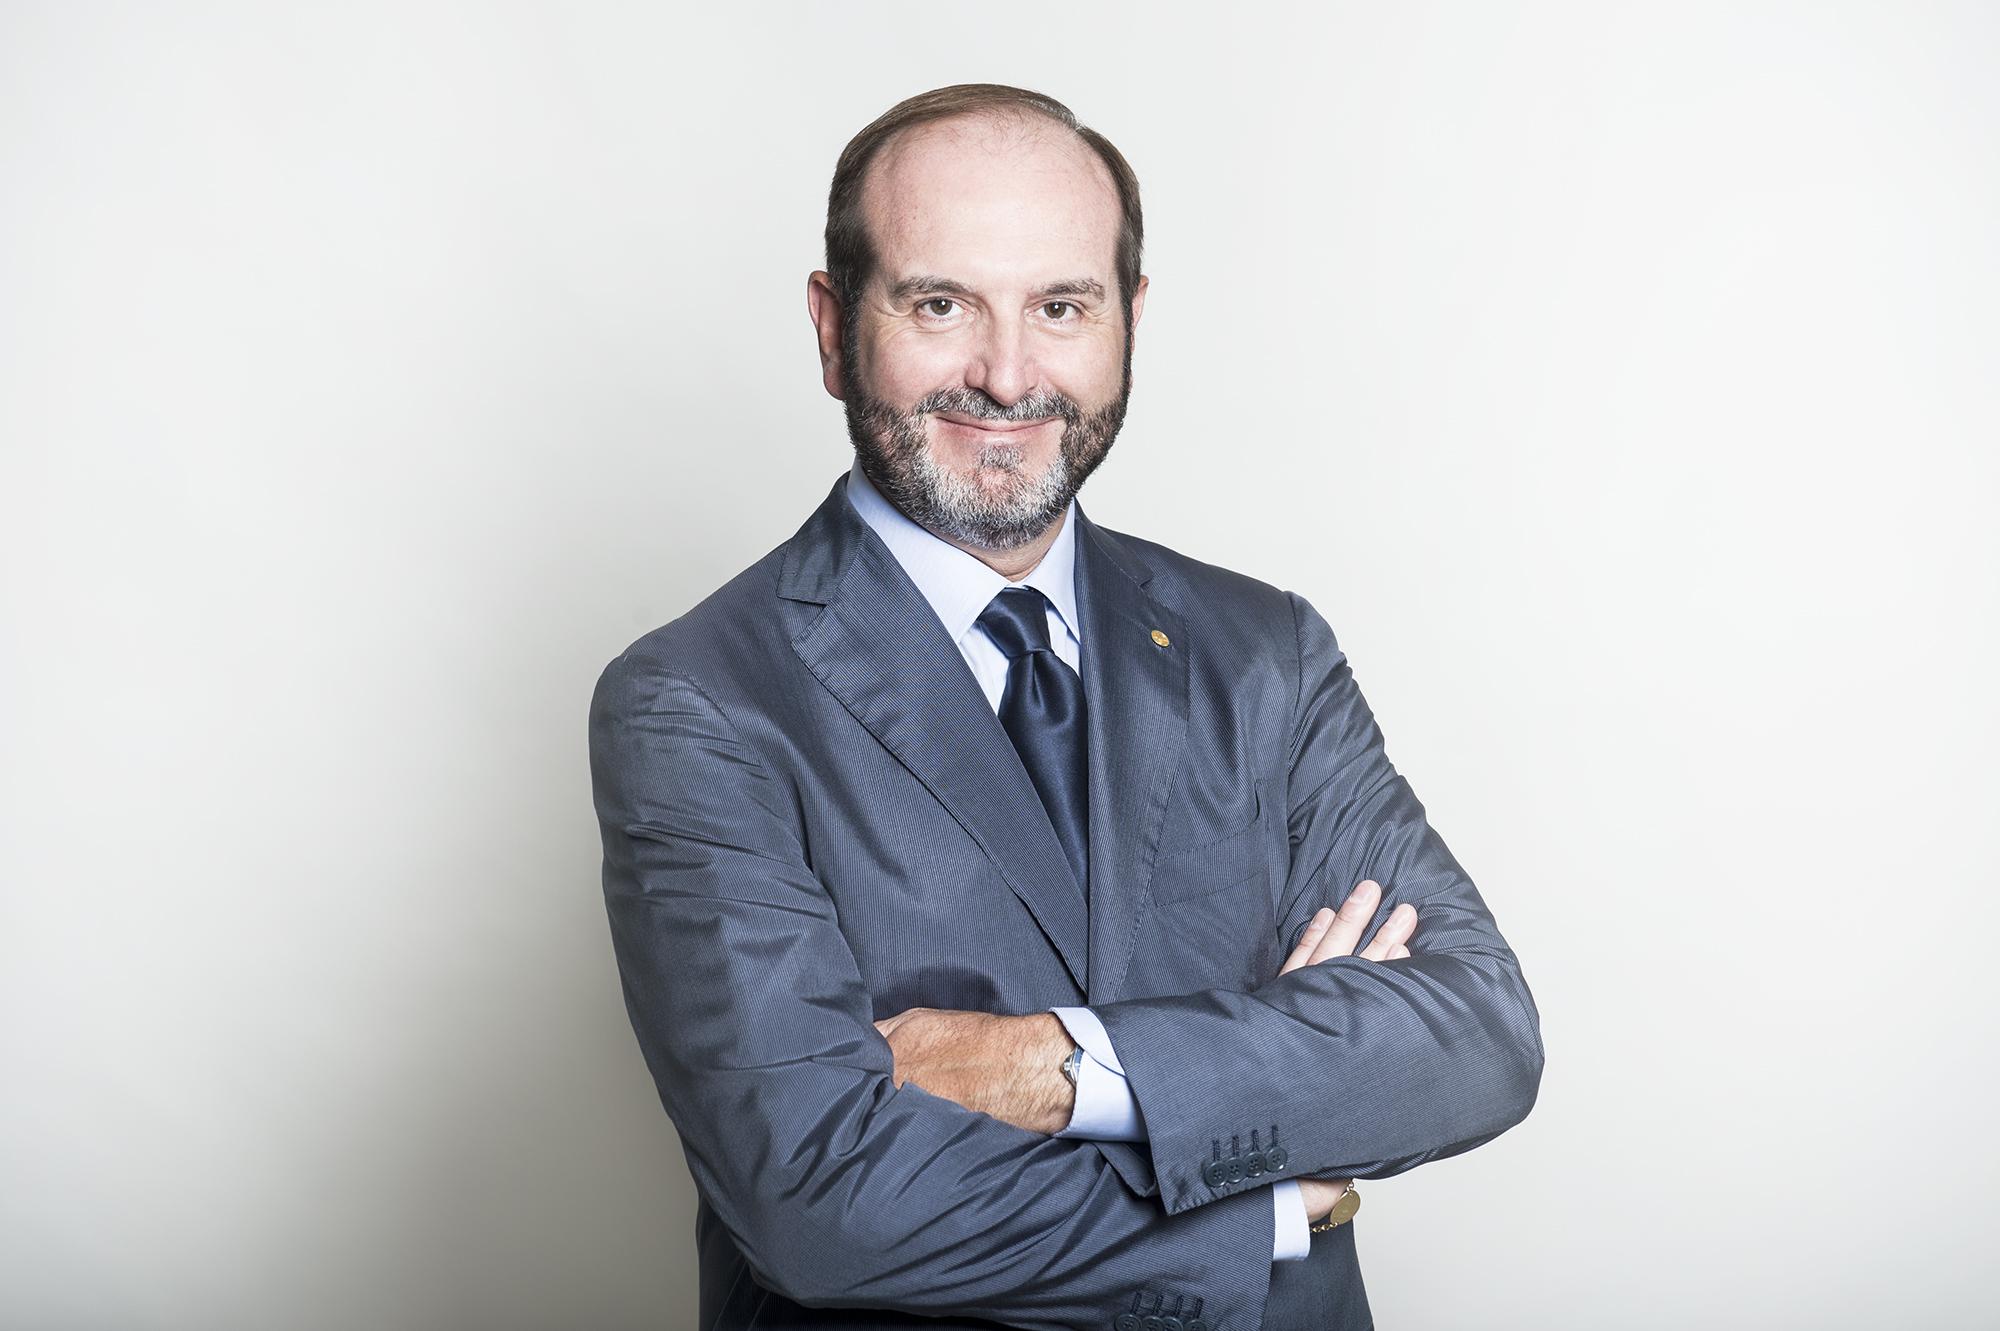 Fabio Franchina, Presidente di Framesi